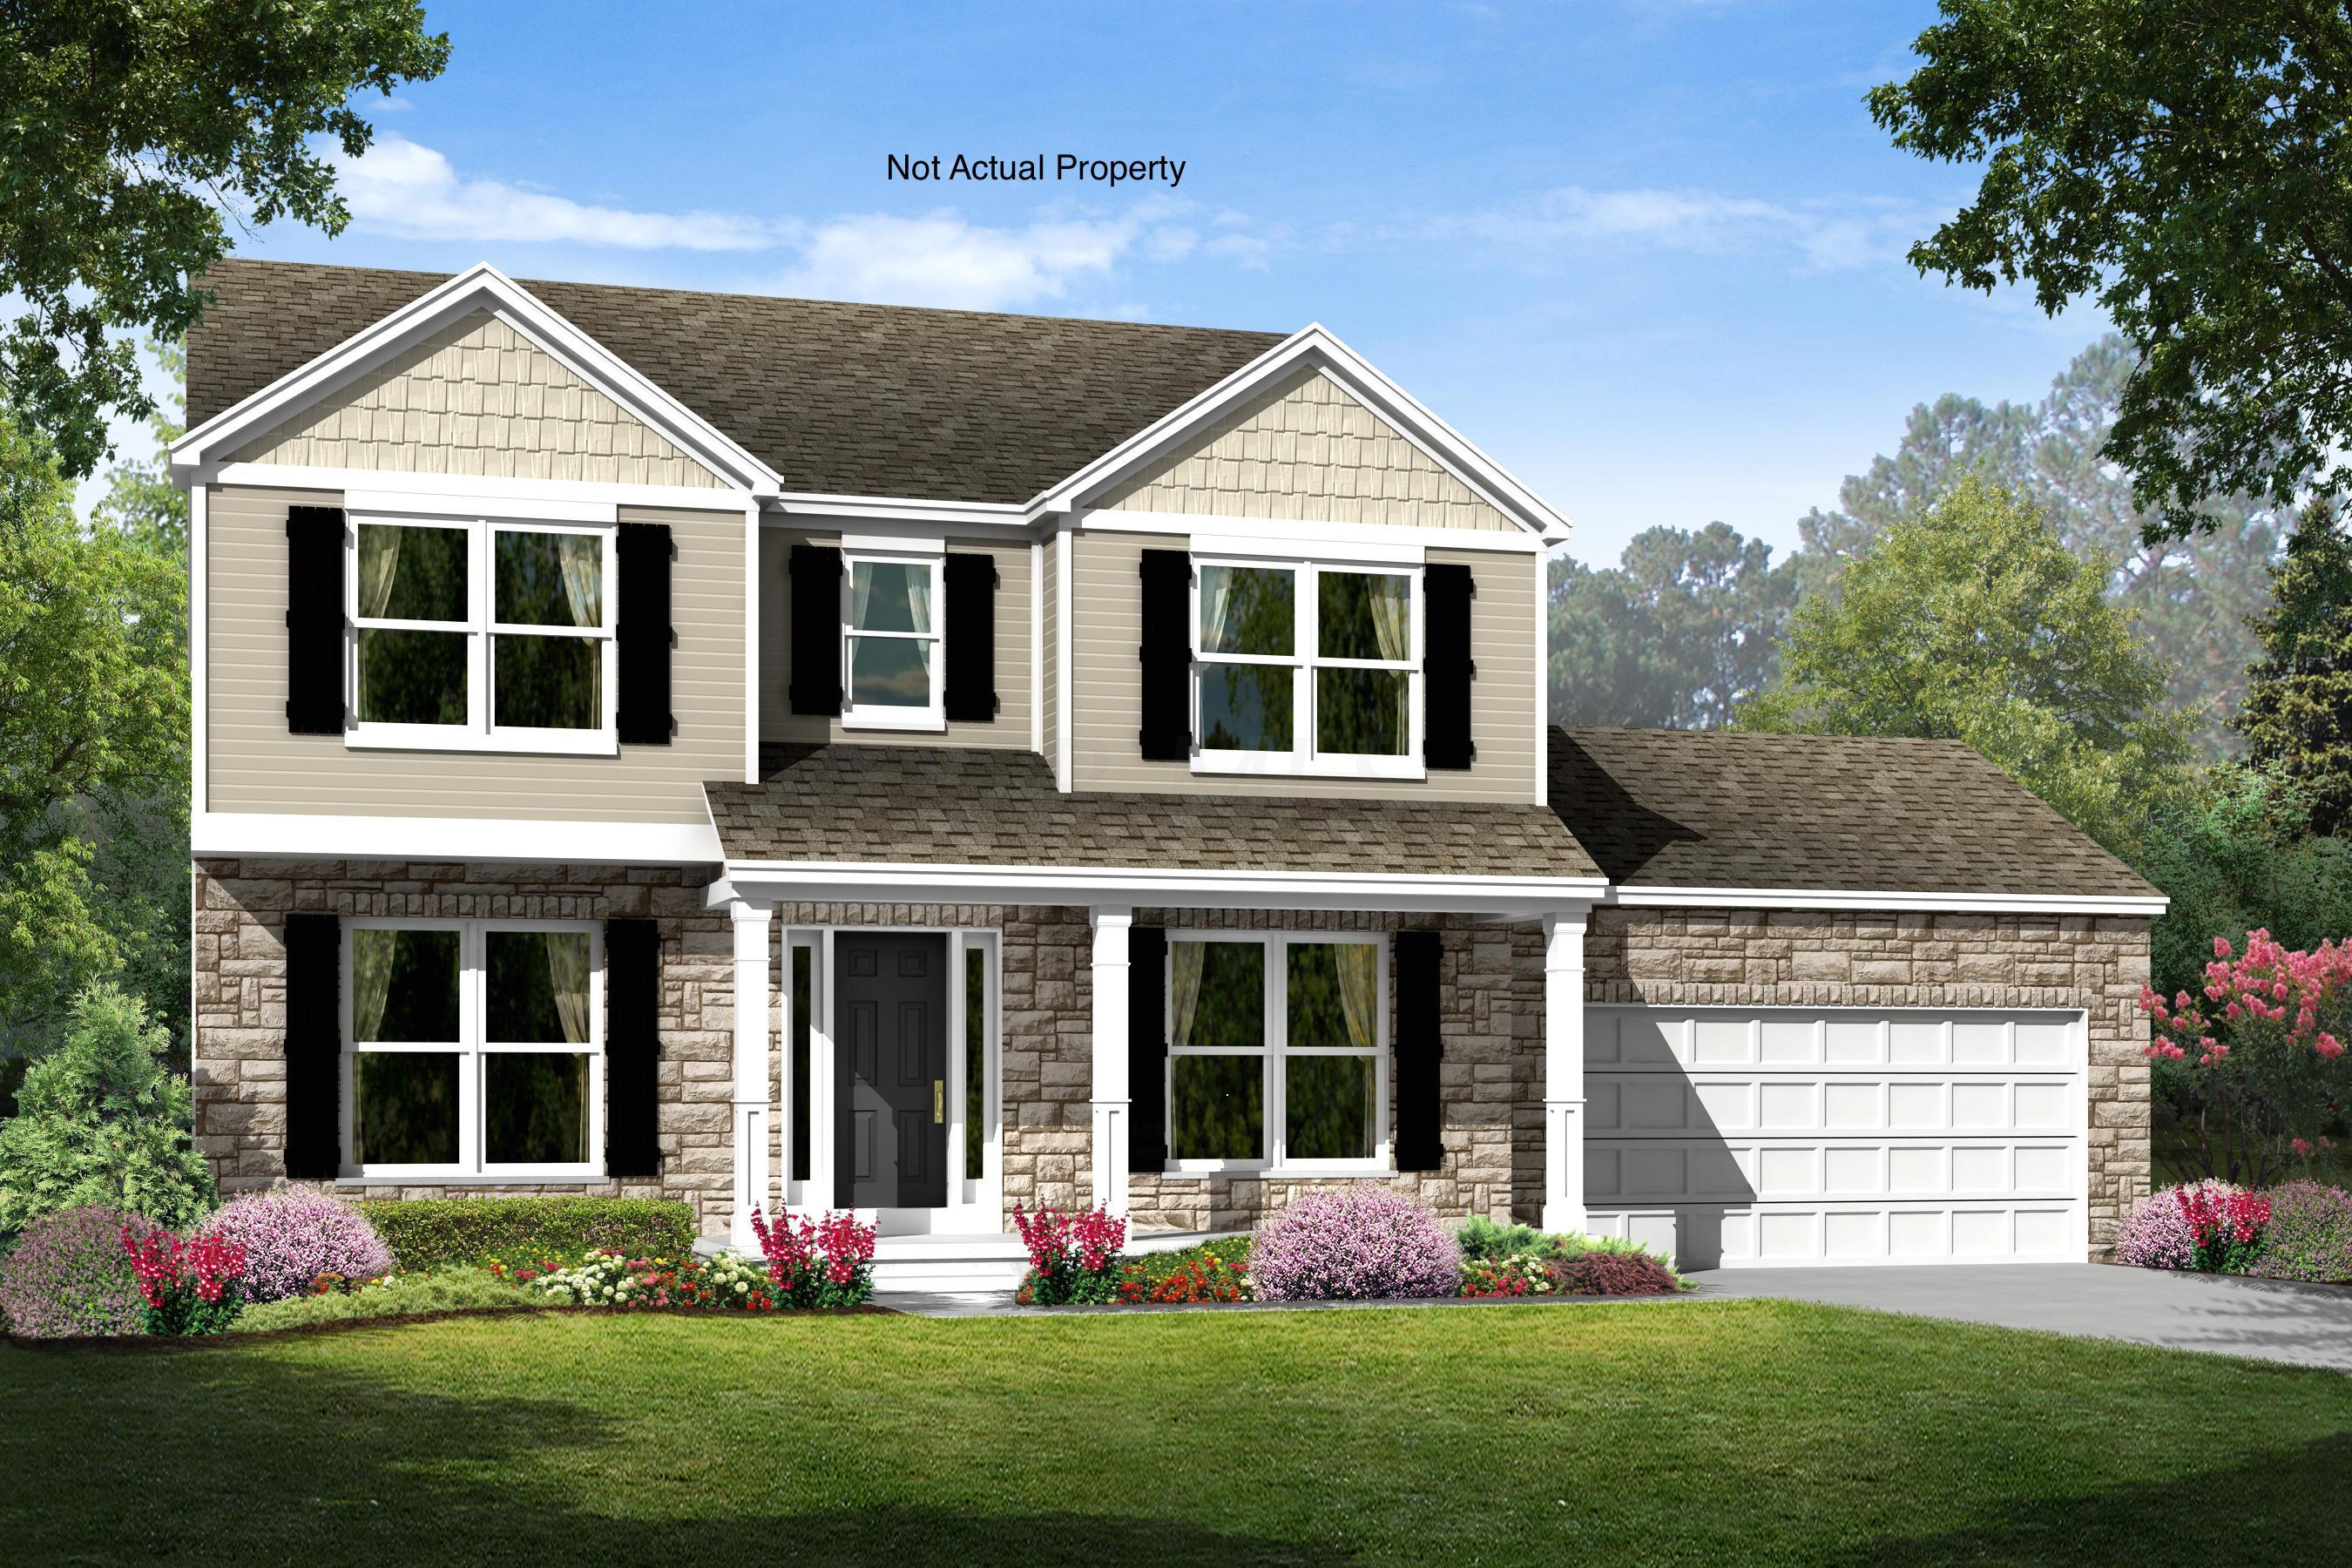 345 Colony Ridge Drive, Delaware, Ohio 43015, 4 Bedrooms Bedrooms, ,3 BathroomsBathrooms,Residential,For Sale,Colony Ridge,220025237